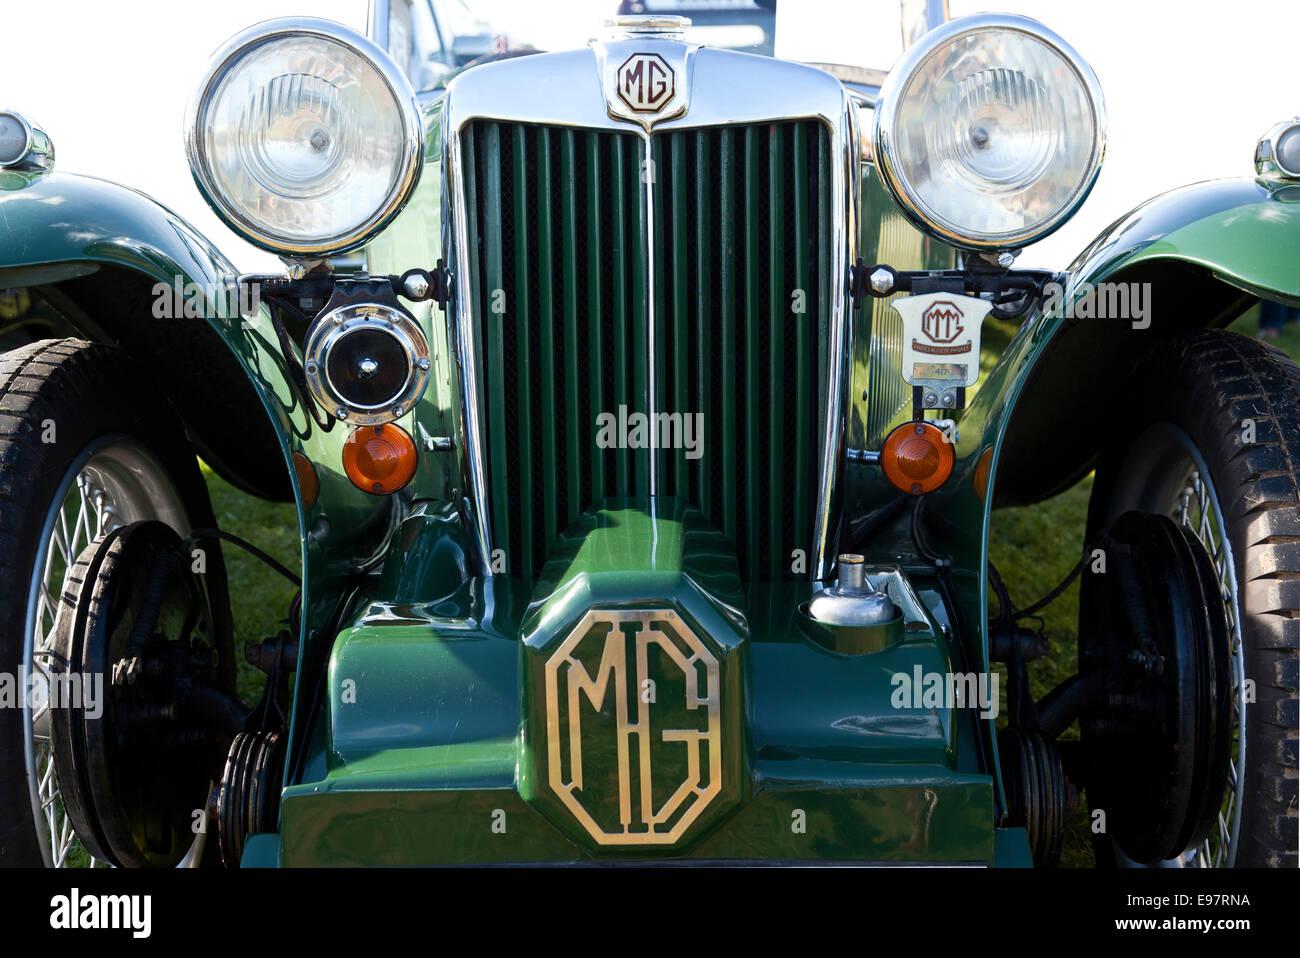 A green vintage MG motor vehicle - Stock Image